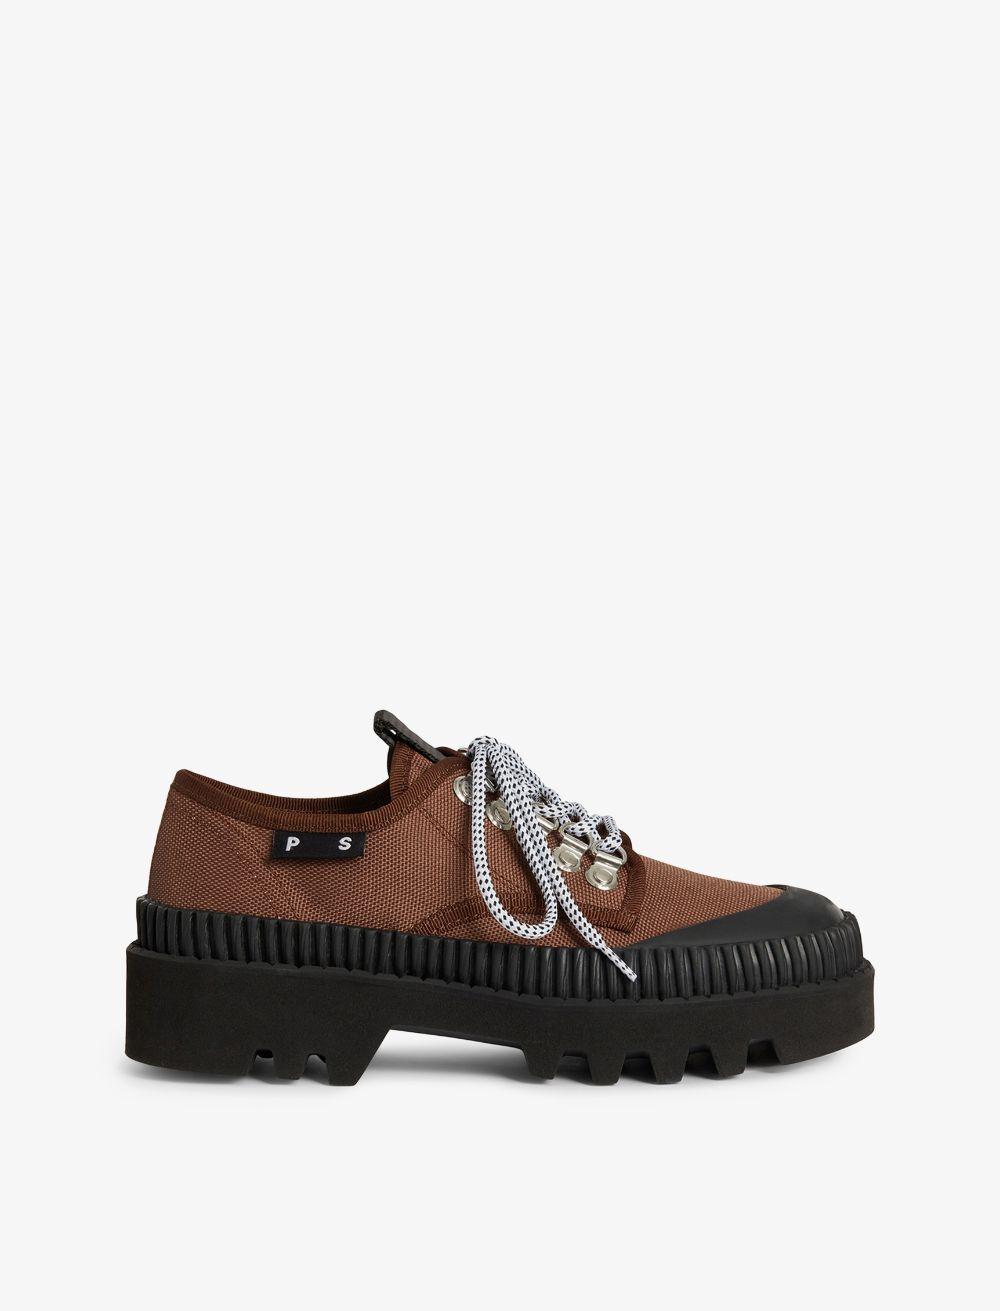 Proenza Schouler City Lug Sole Shoes 521 cinnamon/brown 35